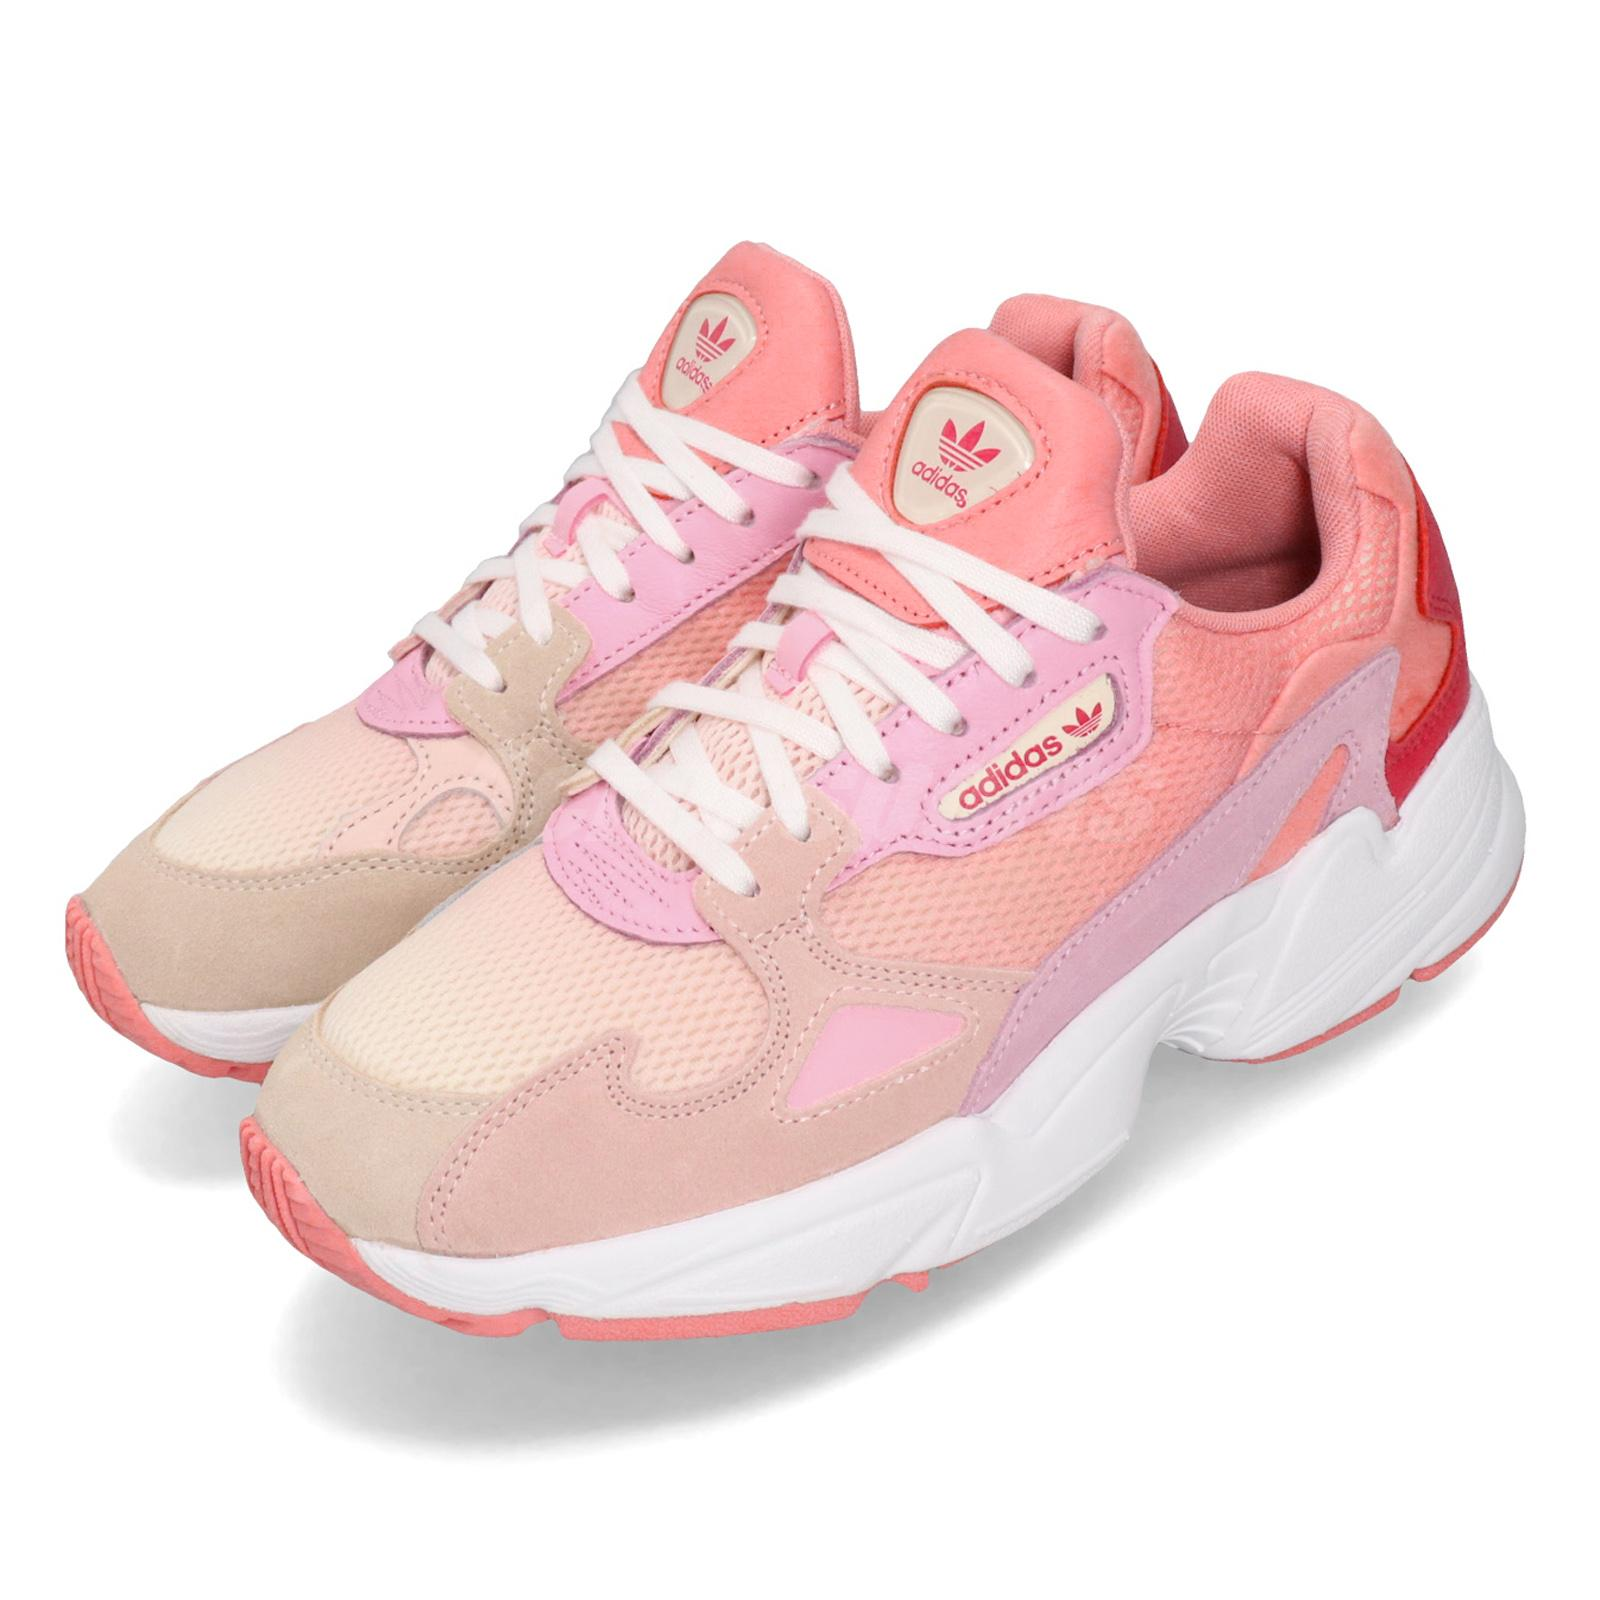 adidas Falcon W Originals Pink White